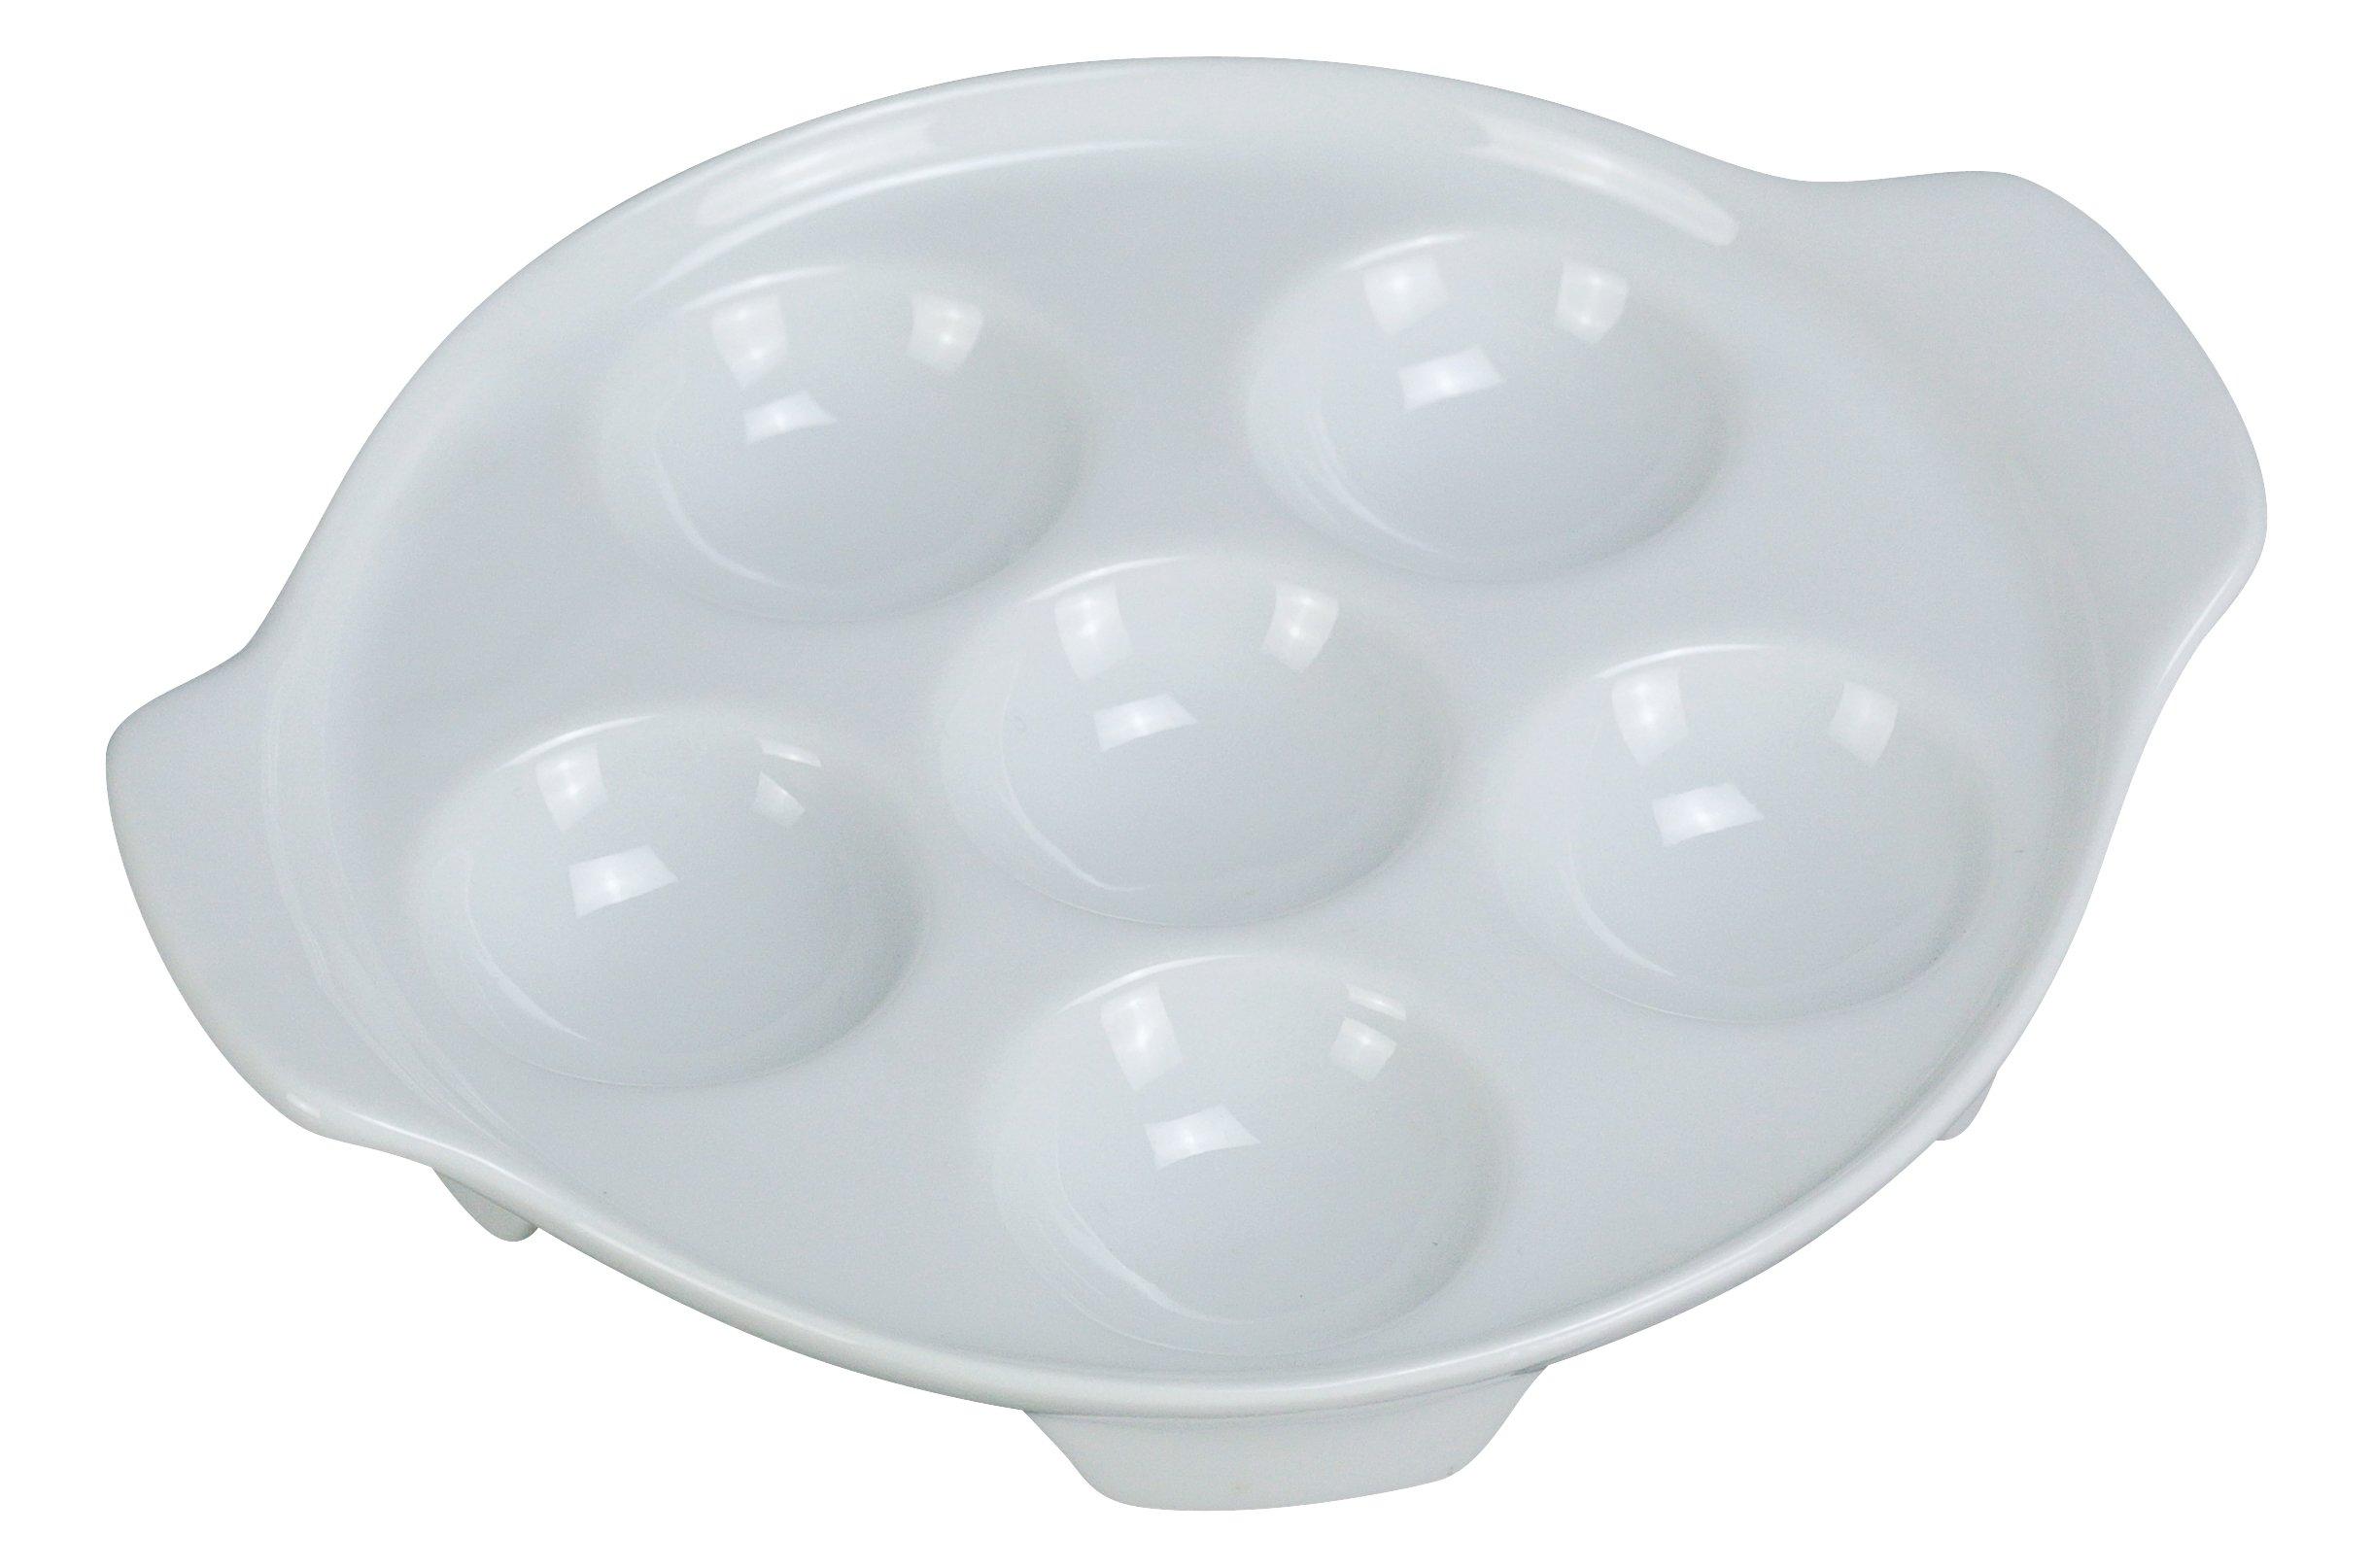 Yanco ESC-8 Escargot Dish, 6.5'' Diameter, Porcelain, Super White, Pack of 24